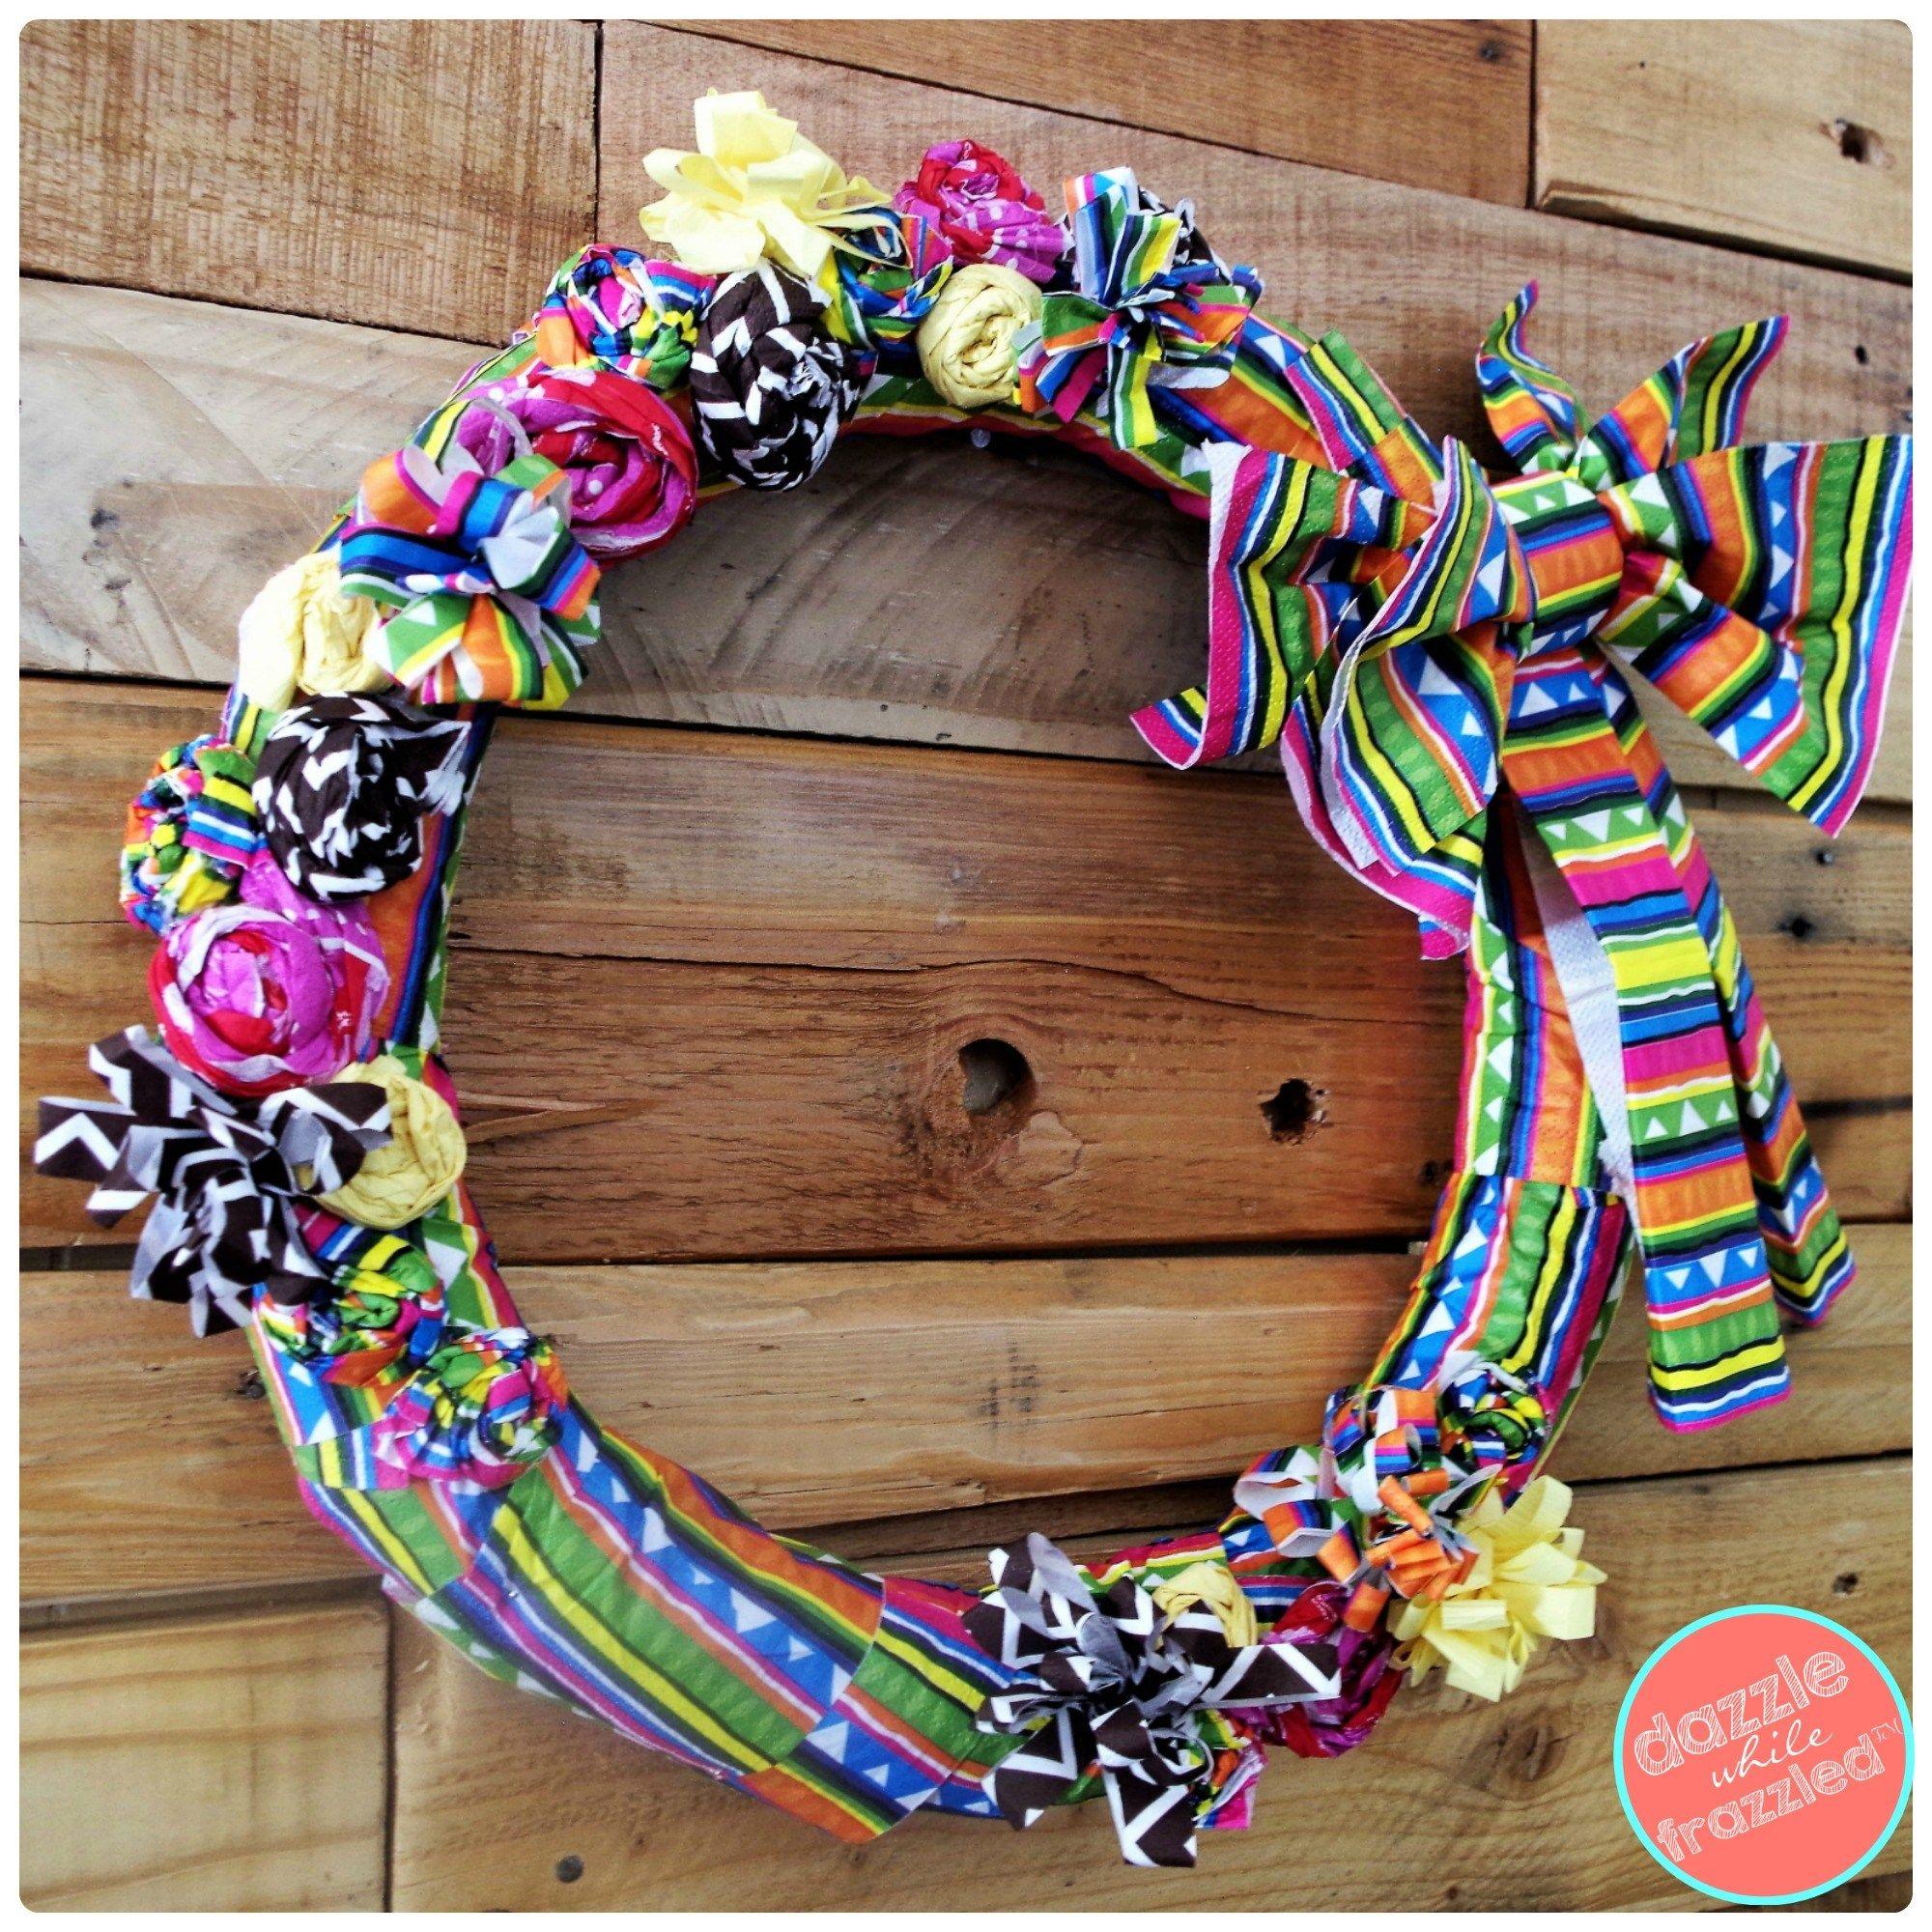 DIY Summertime Fiesta Wreath from Paper Napkins Wreath